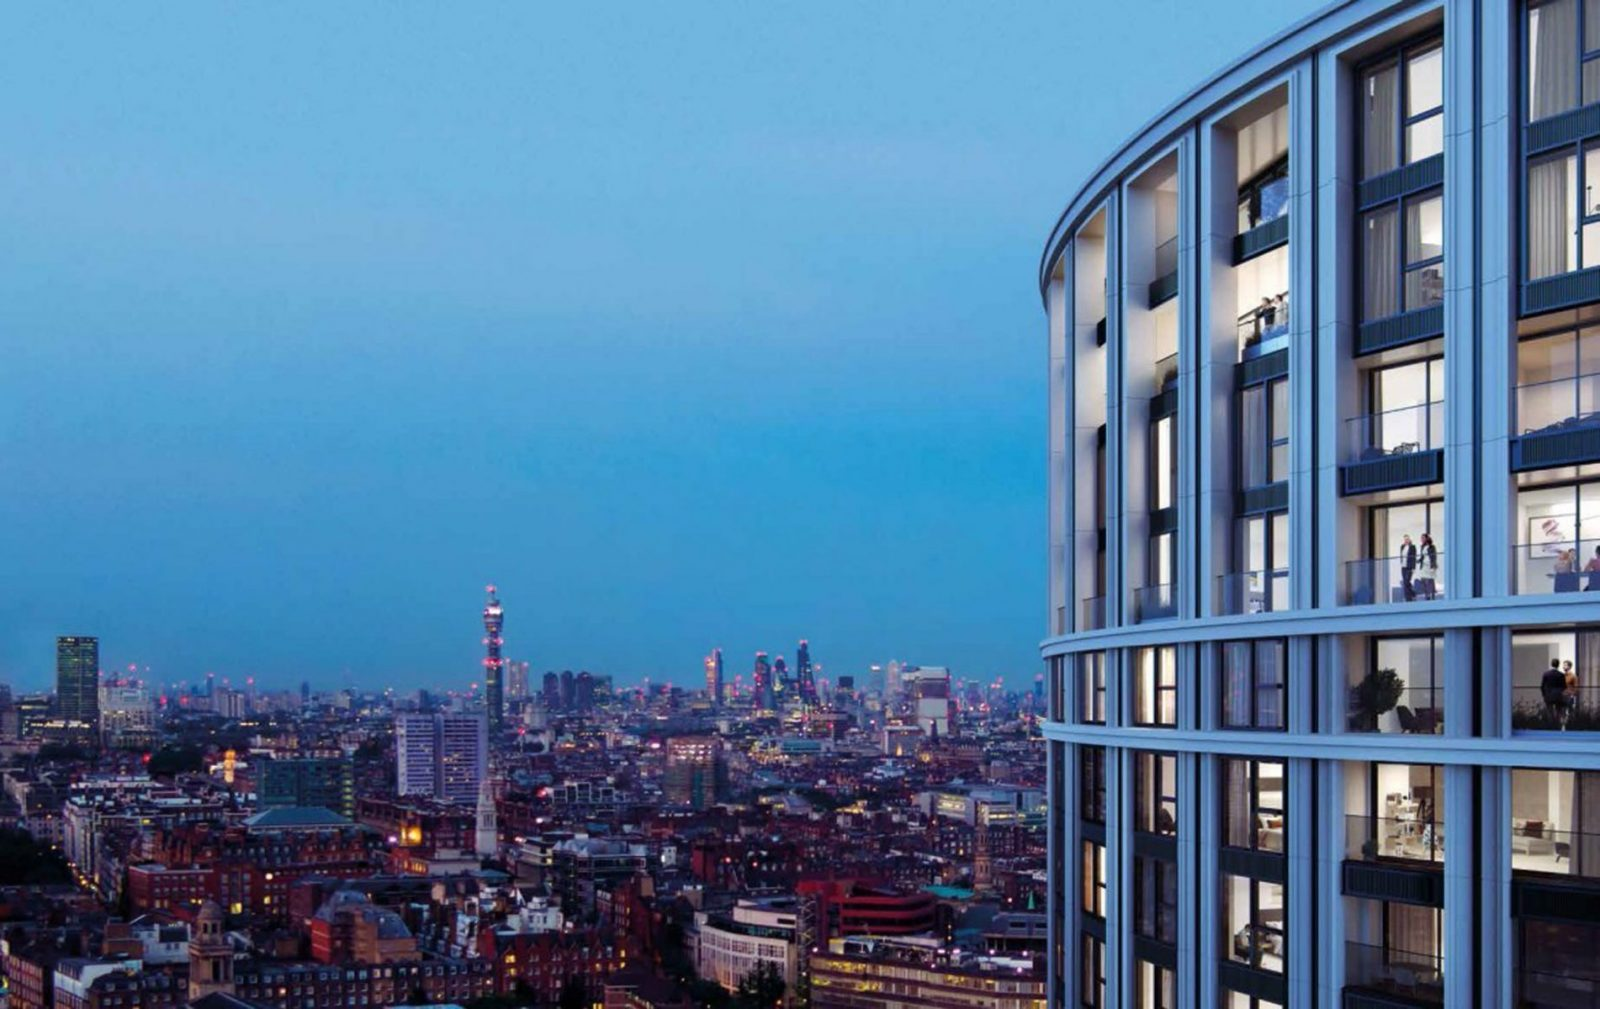 westmark tower london modern georgian architecture berkeley homes architects jersey11